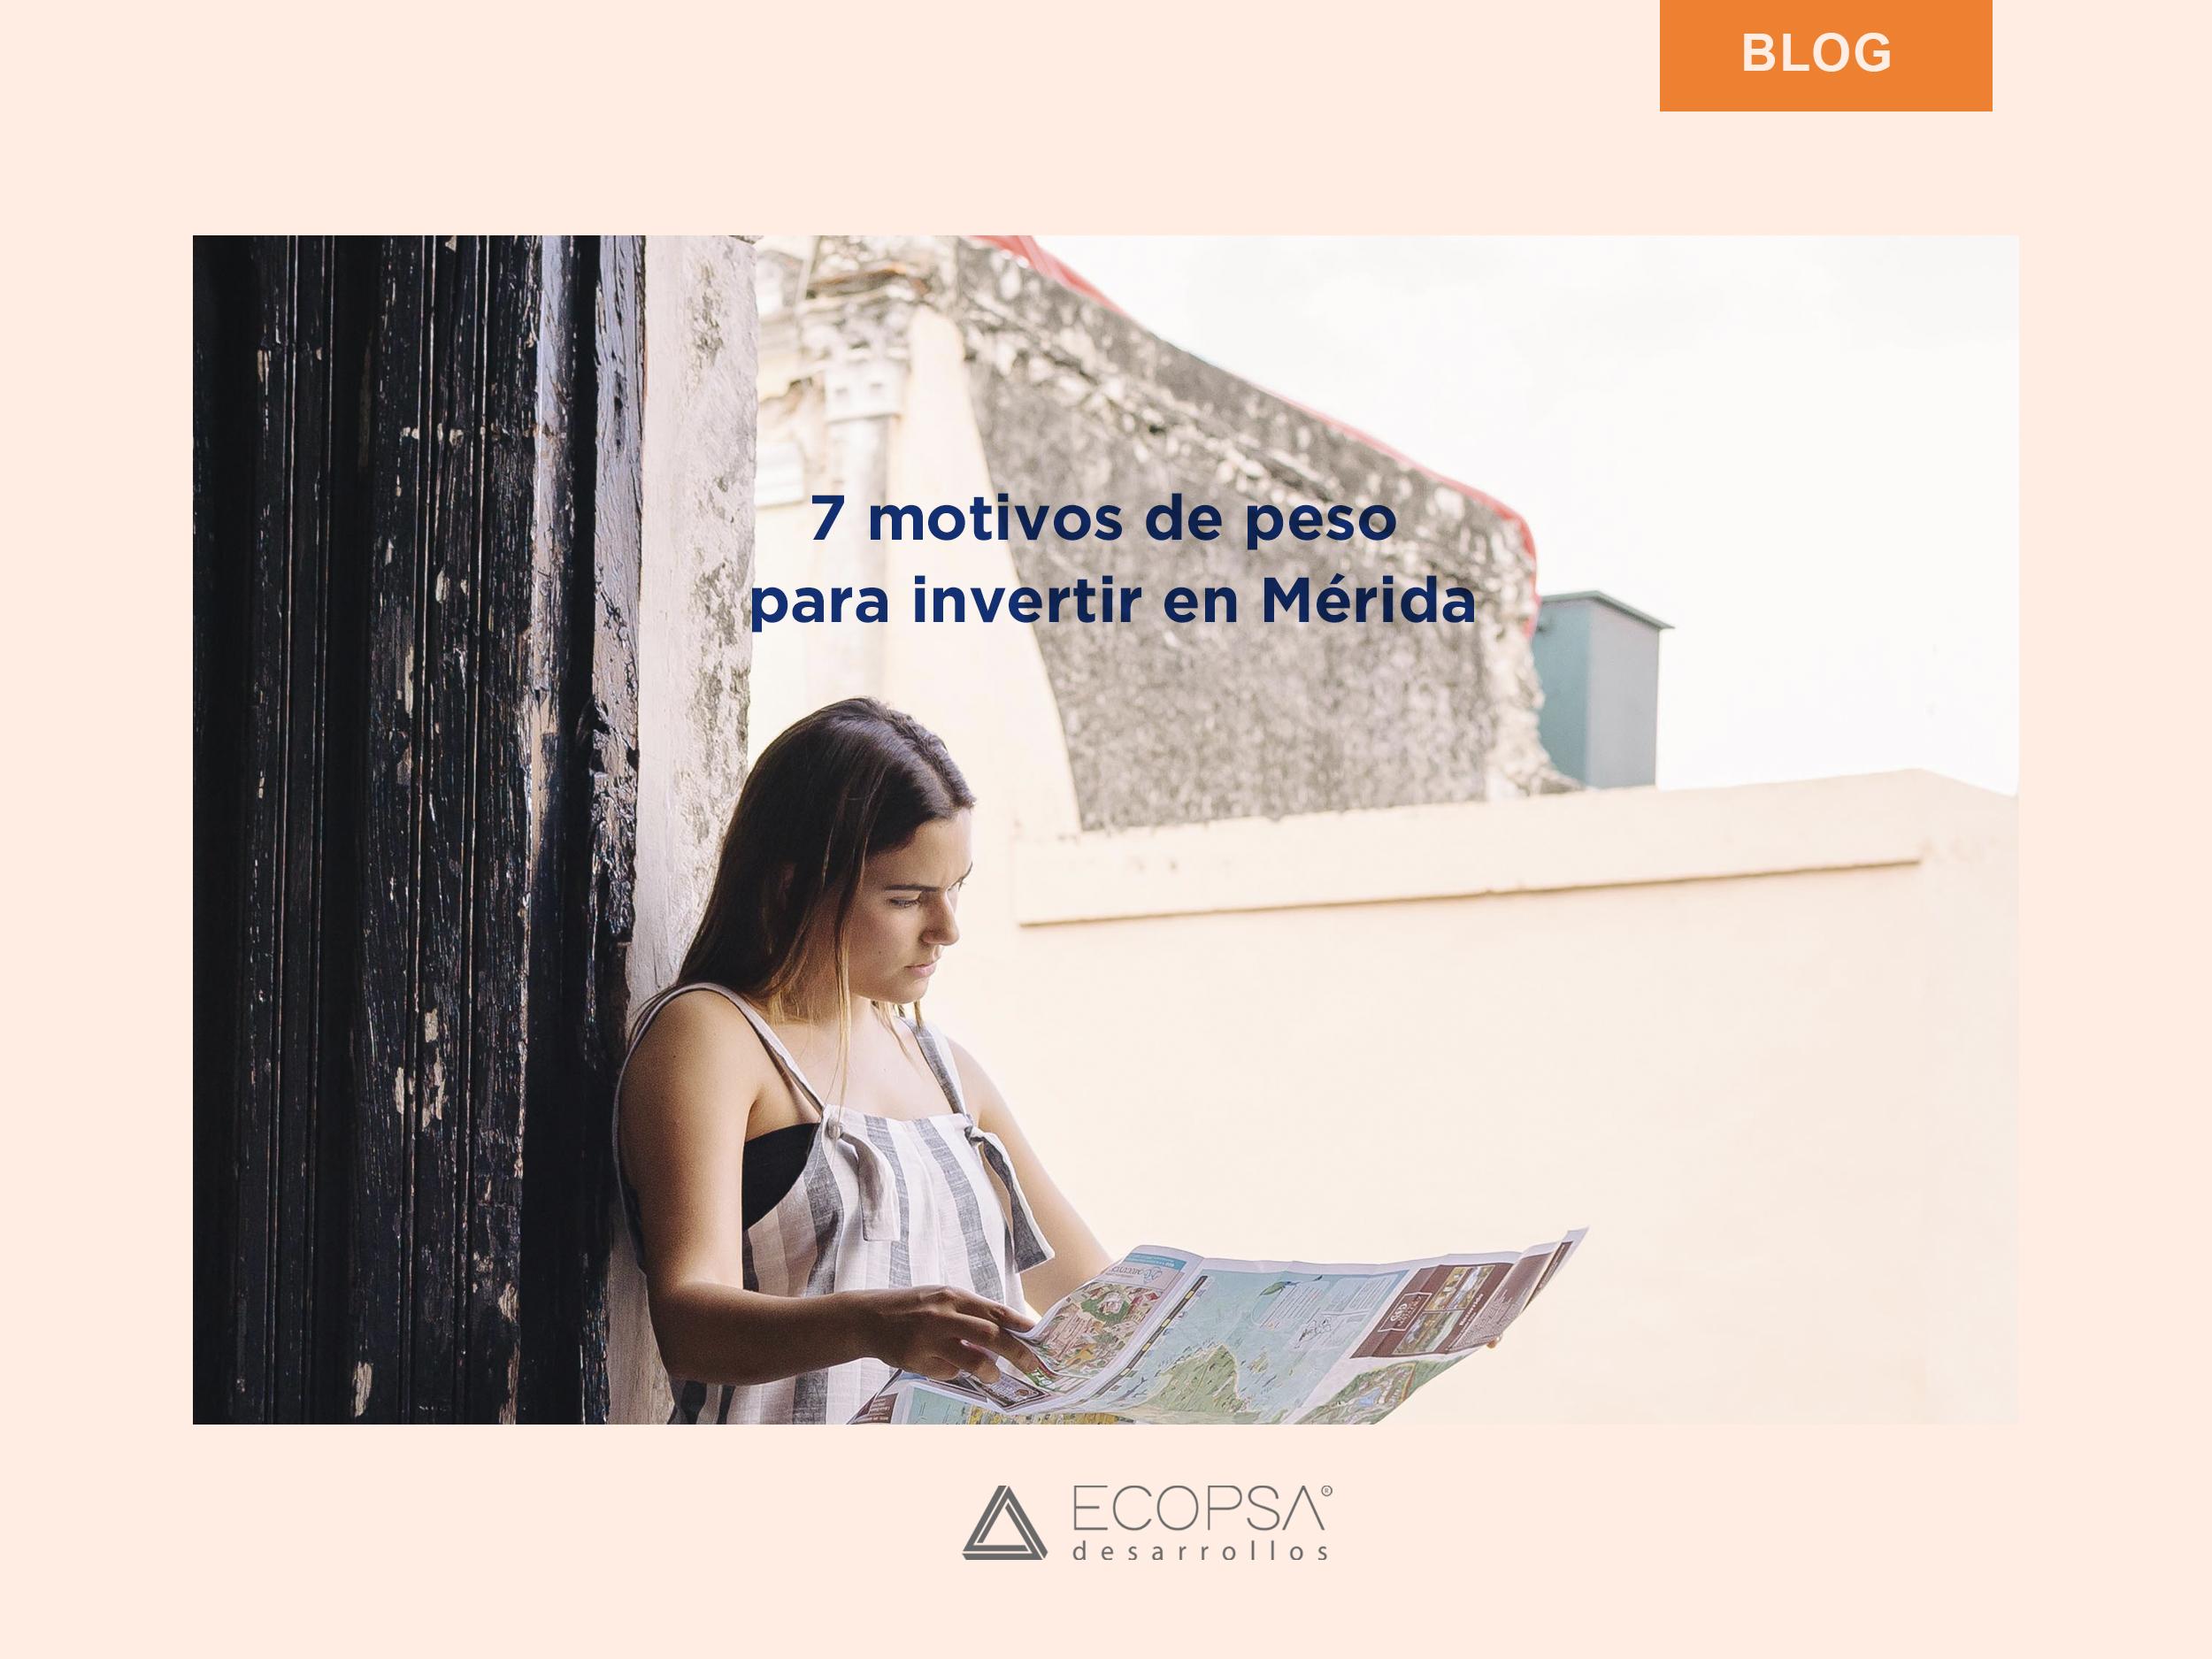 7 motivos de peso para invertir en Mérida